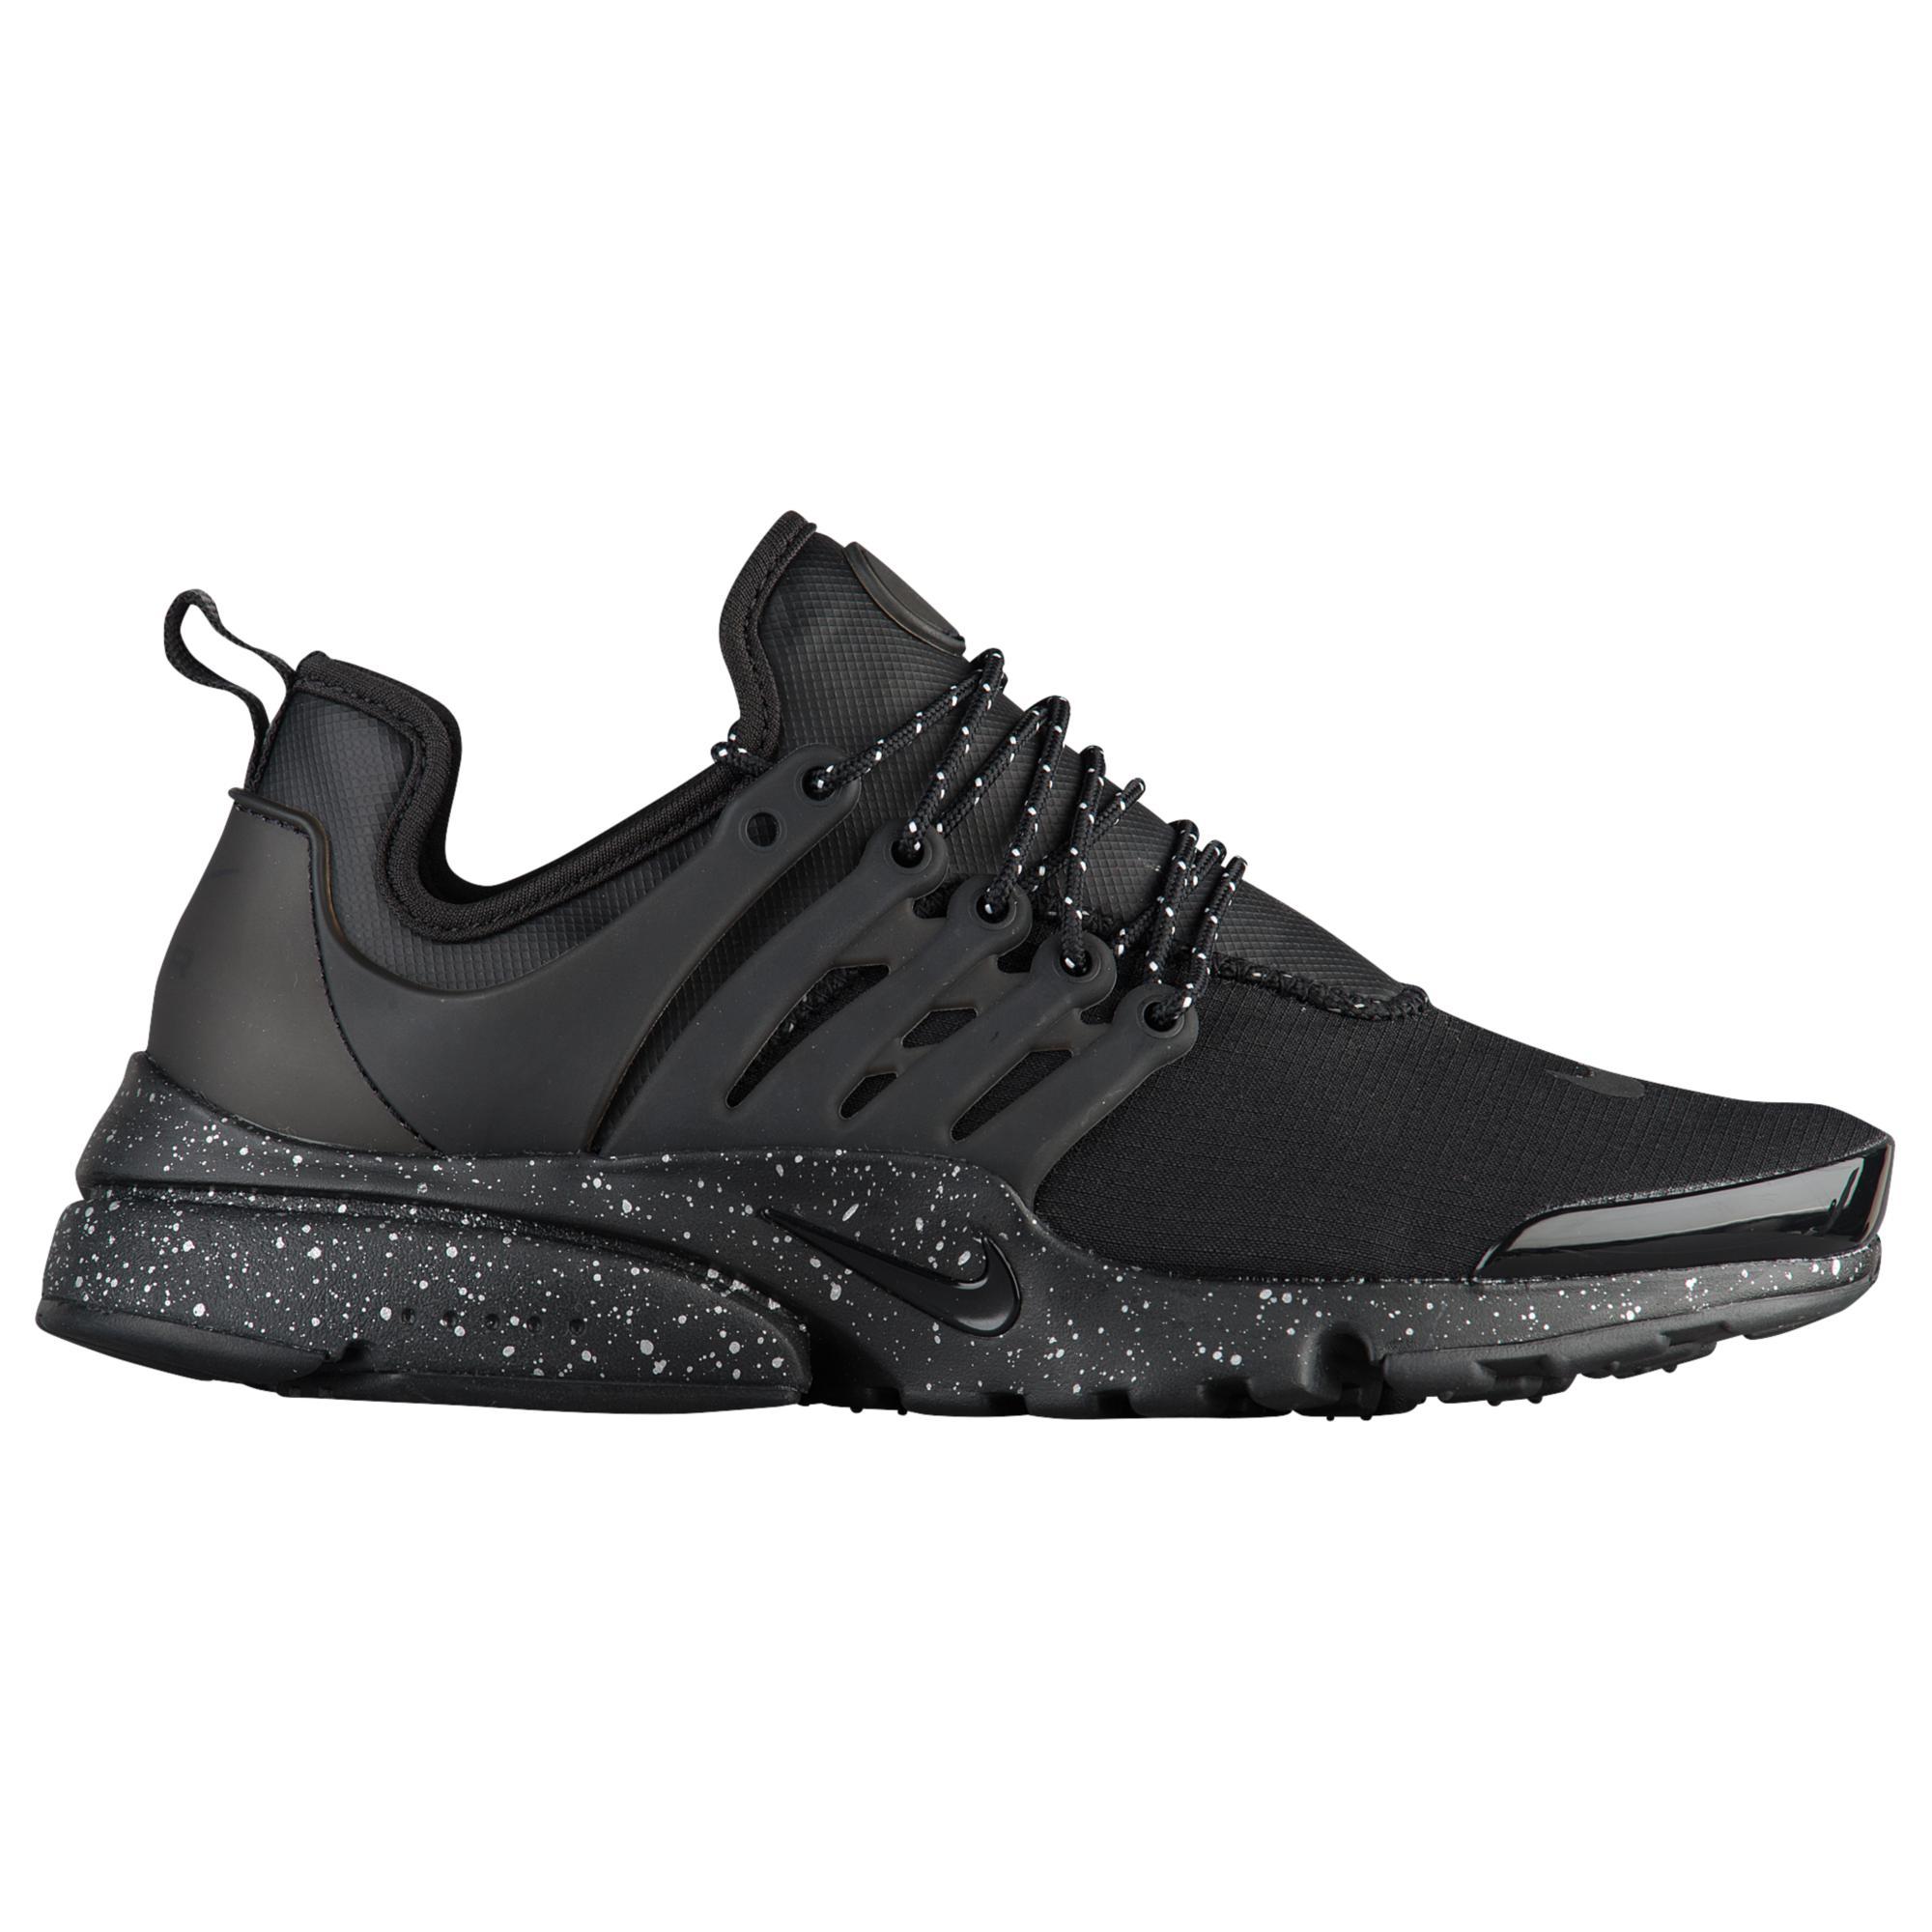 83baa40a867d7 Lyst - Nike Air Presto Ultra in Black